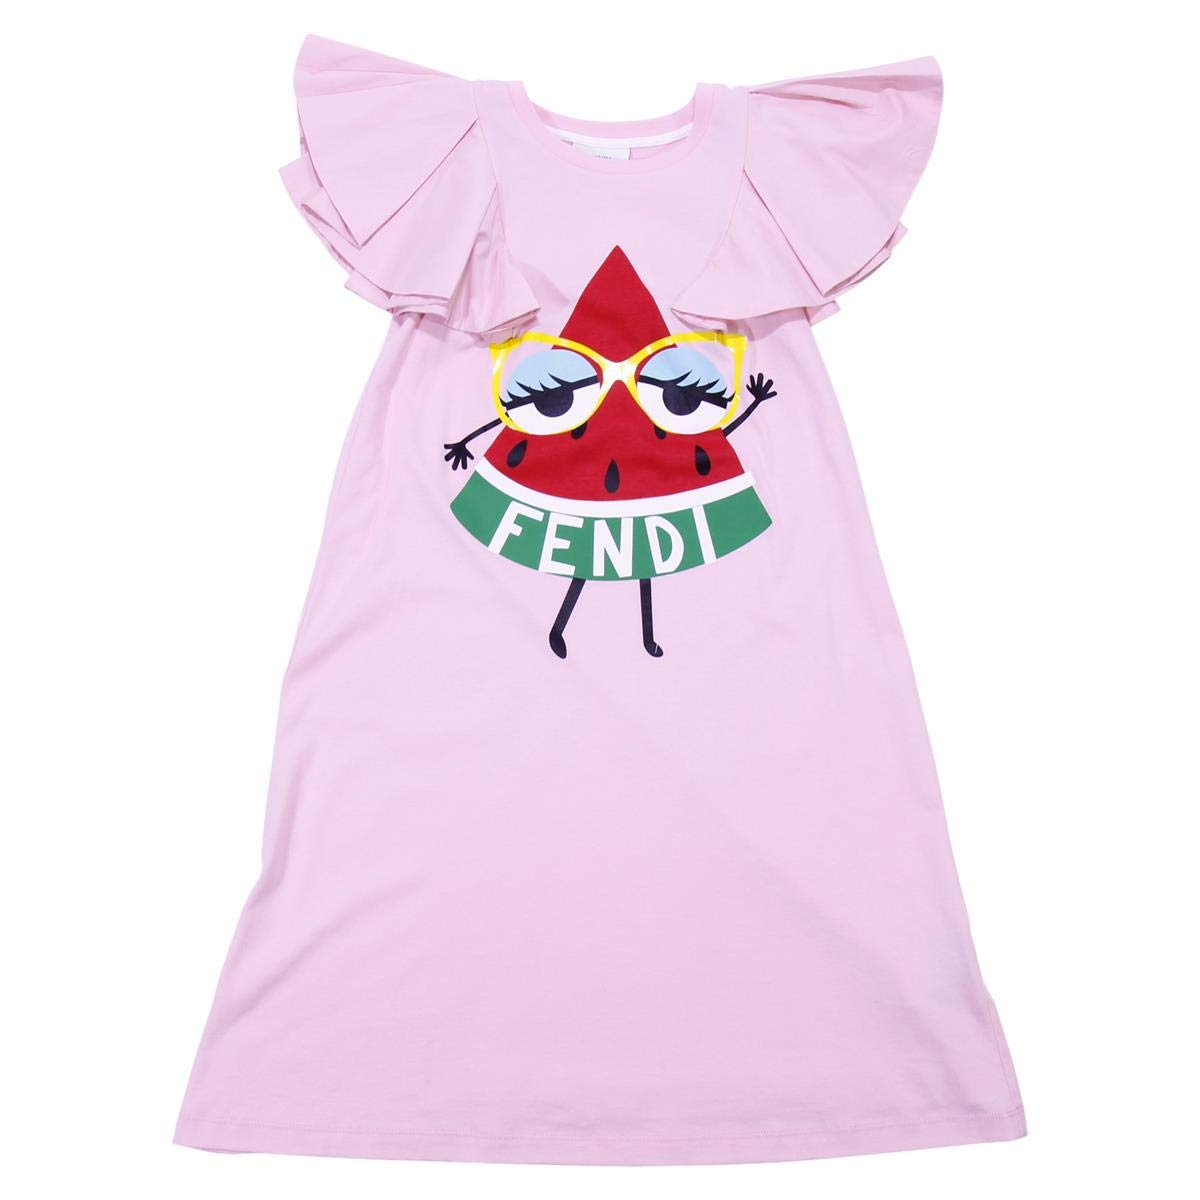 0be2273d63d6 Fendi Girl Pink Cotton Dress Mod. JFB1687AJF0QD1 6 A  Amazon.co.uk  Clothing